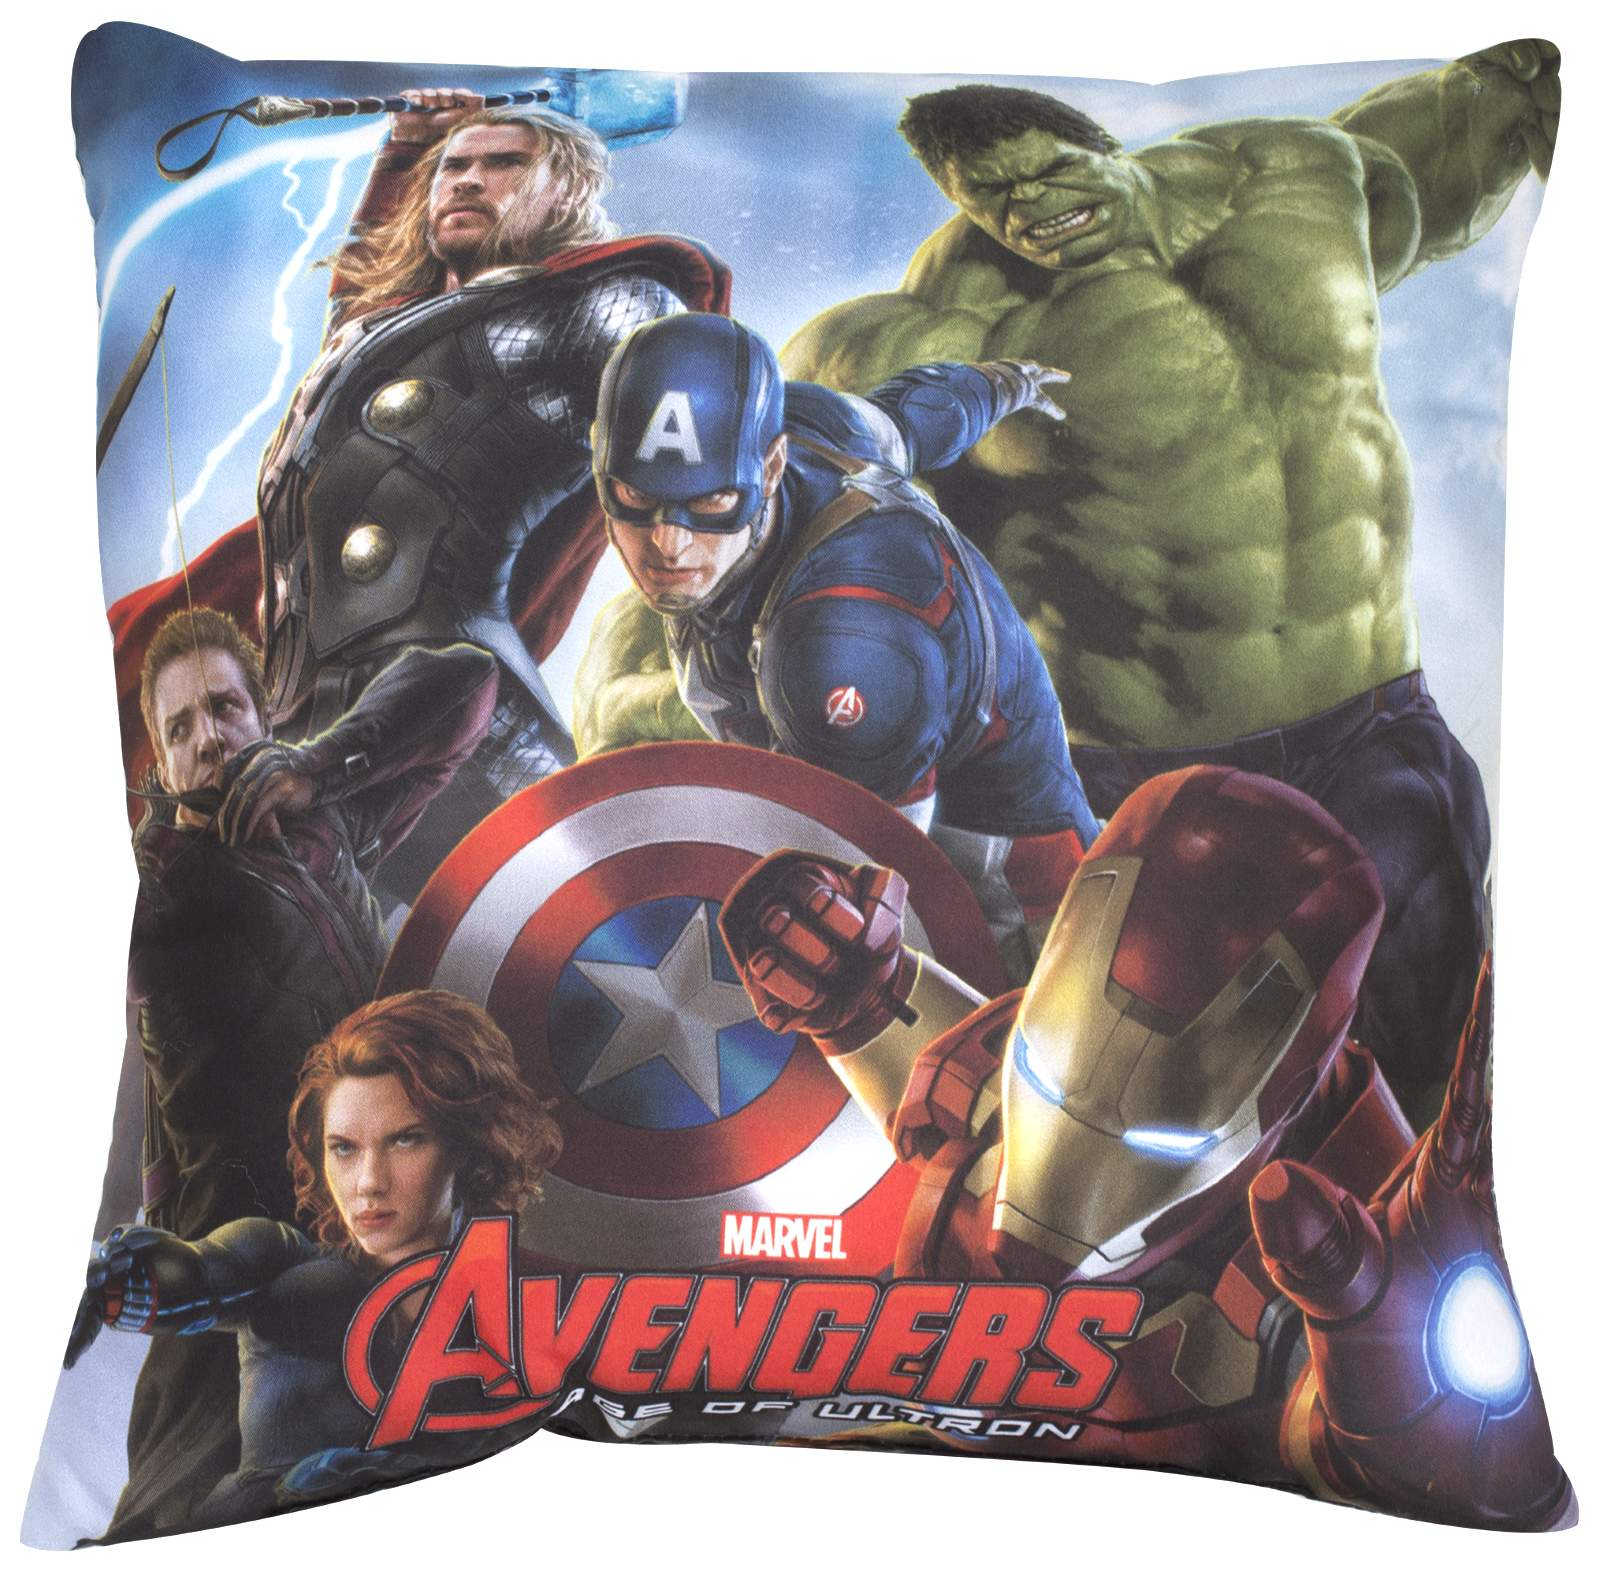 Marvel Avengers Accessories Bedding Single Double Fleece